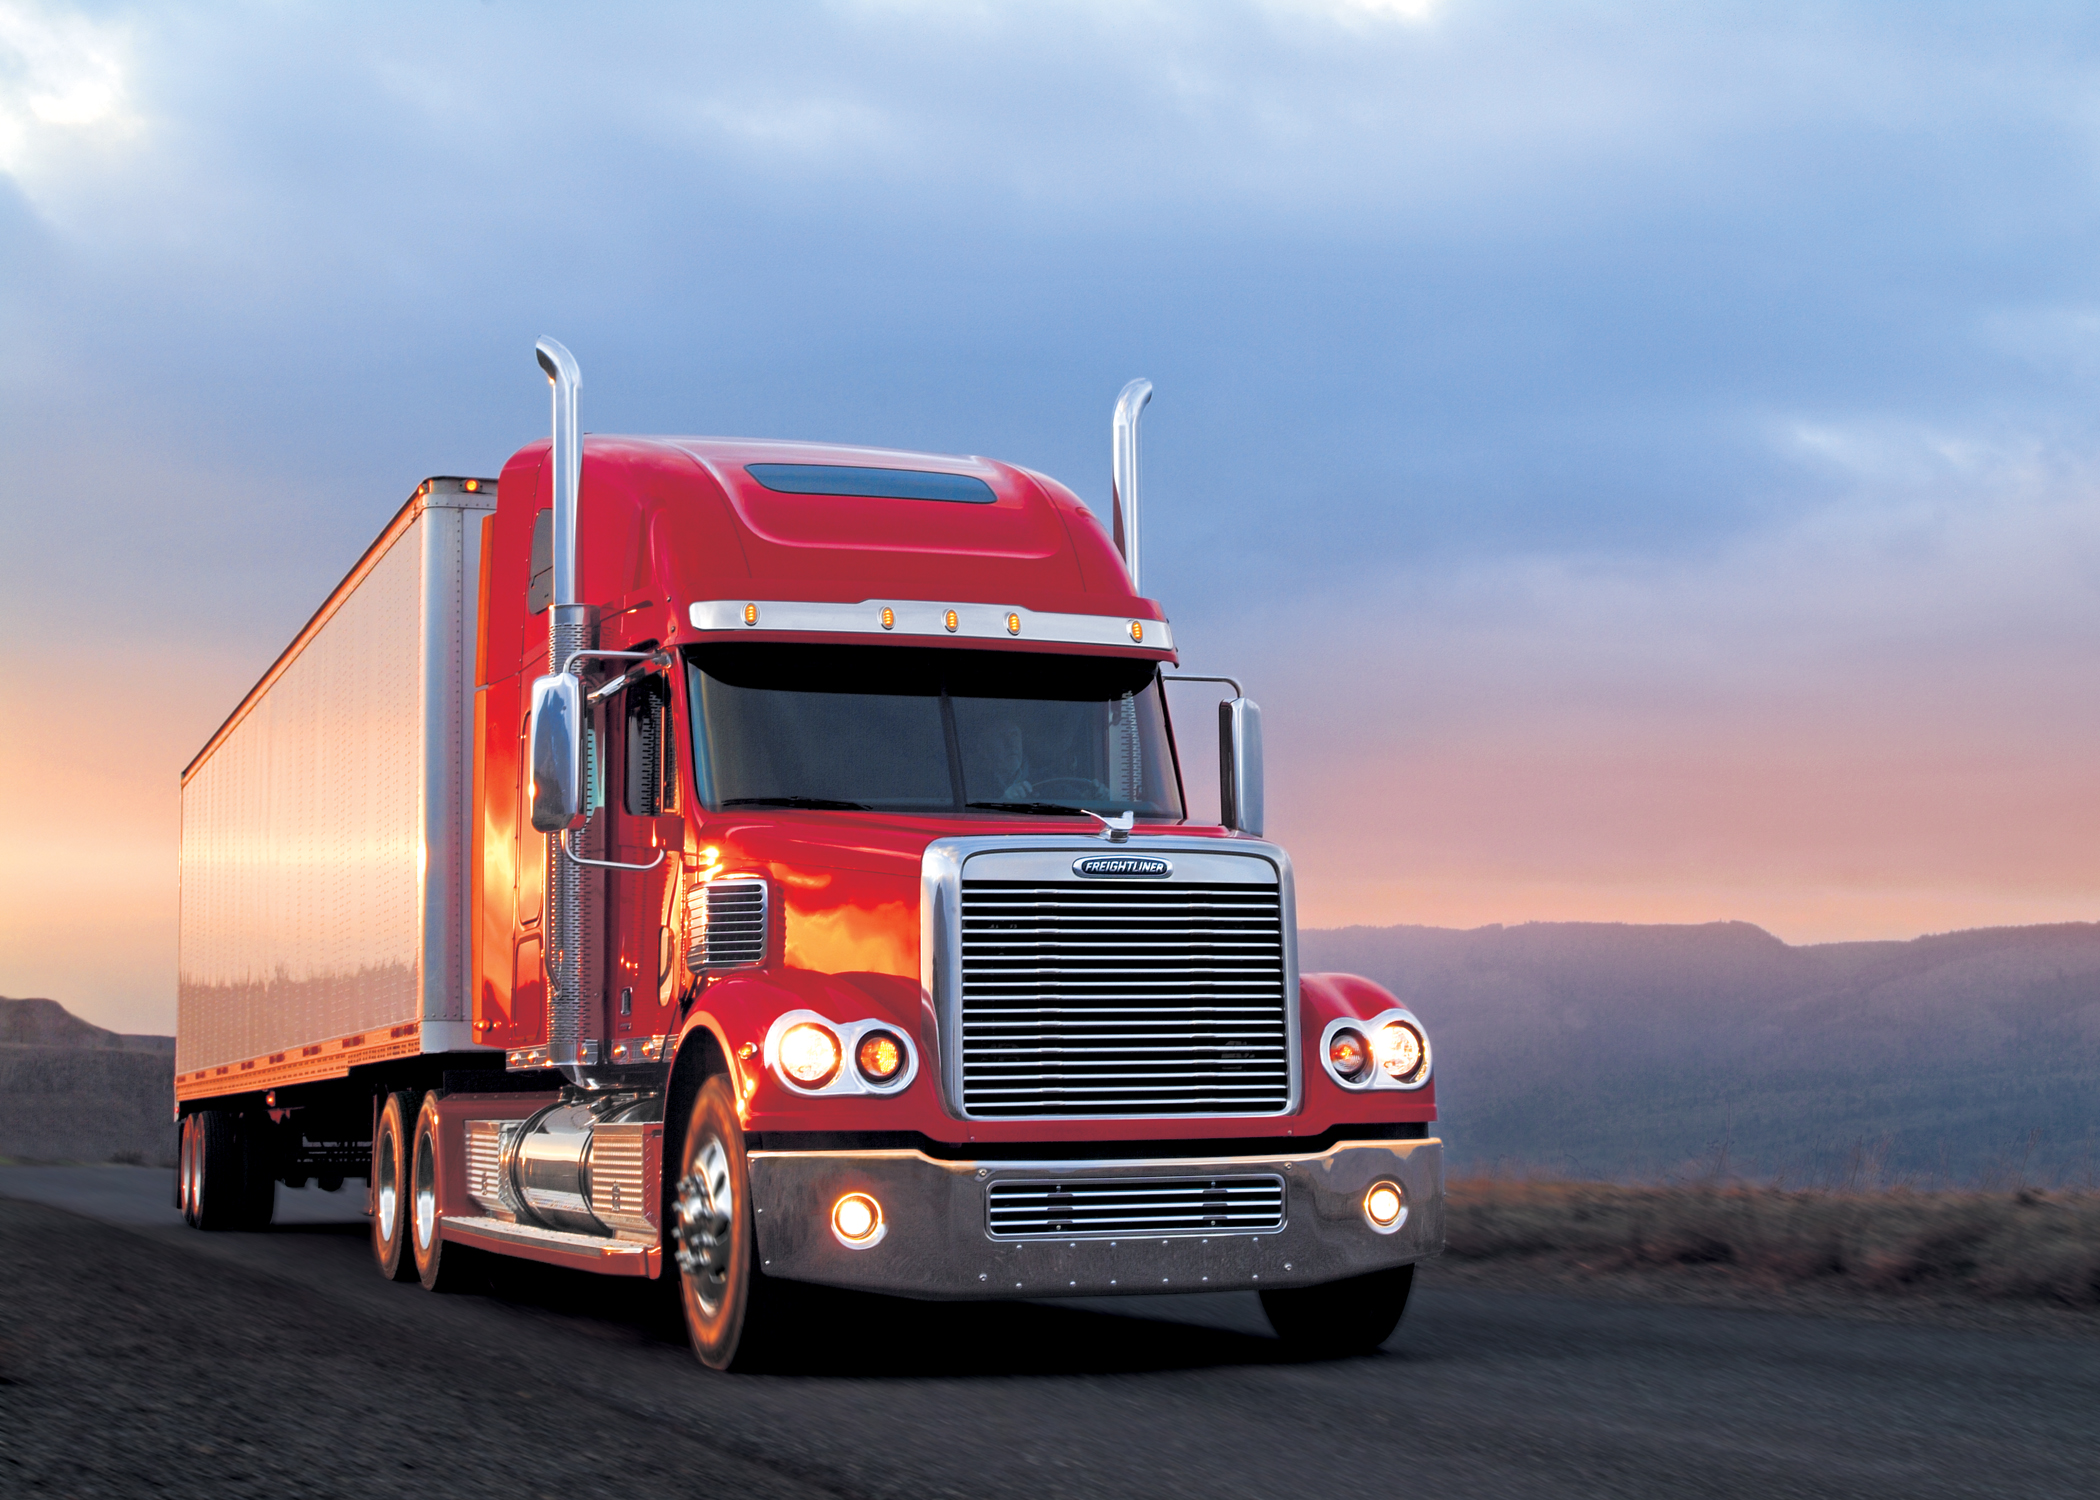 Freightliner Truck Image